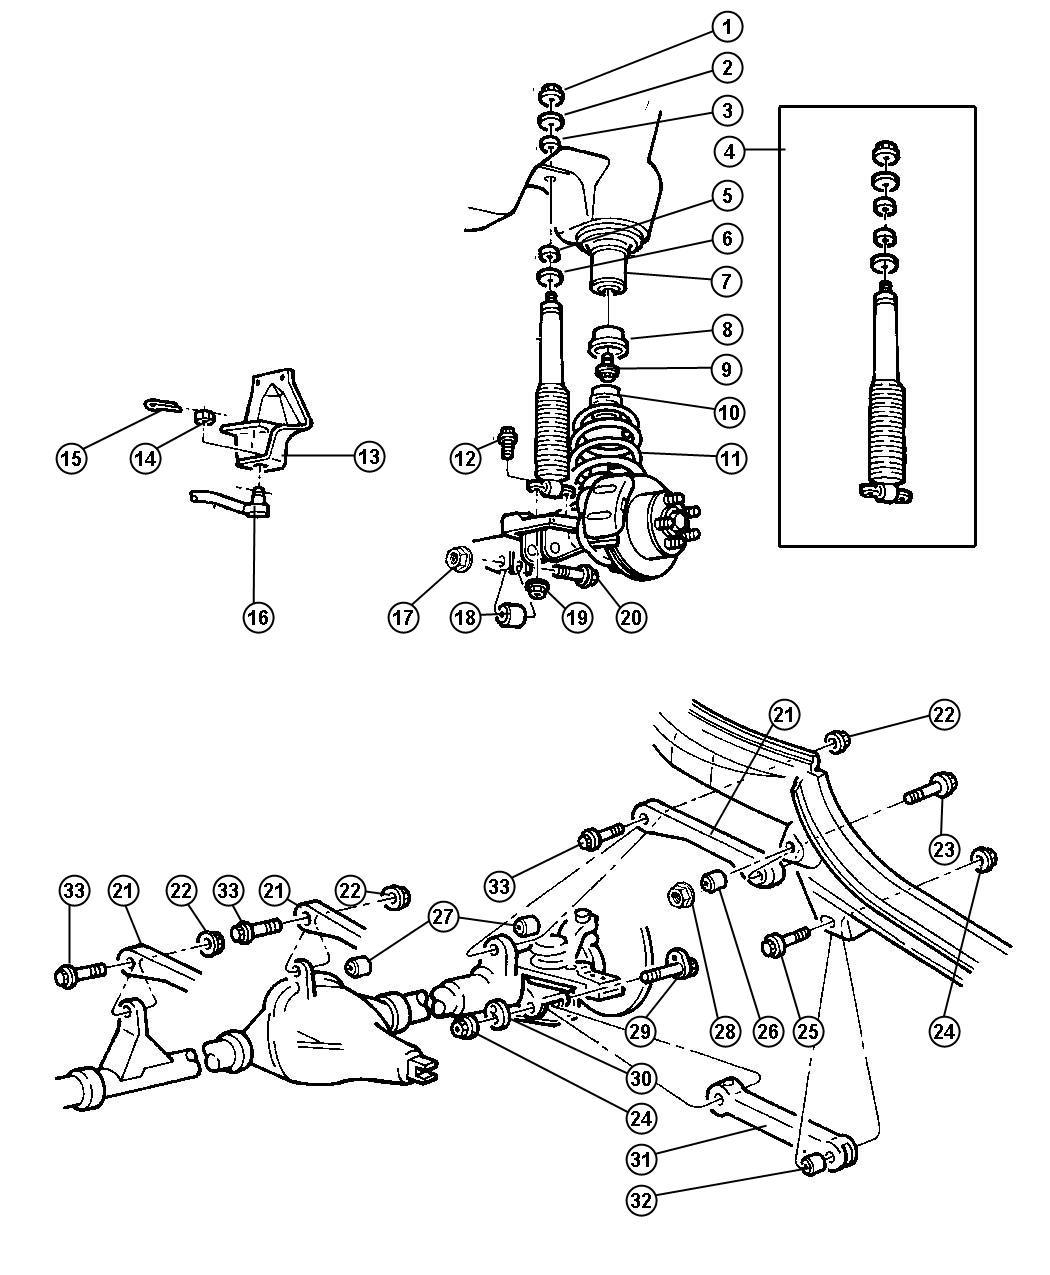 Jeep Wrangler Bar Track Suspension Arms Control